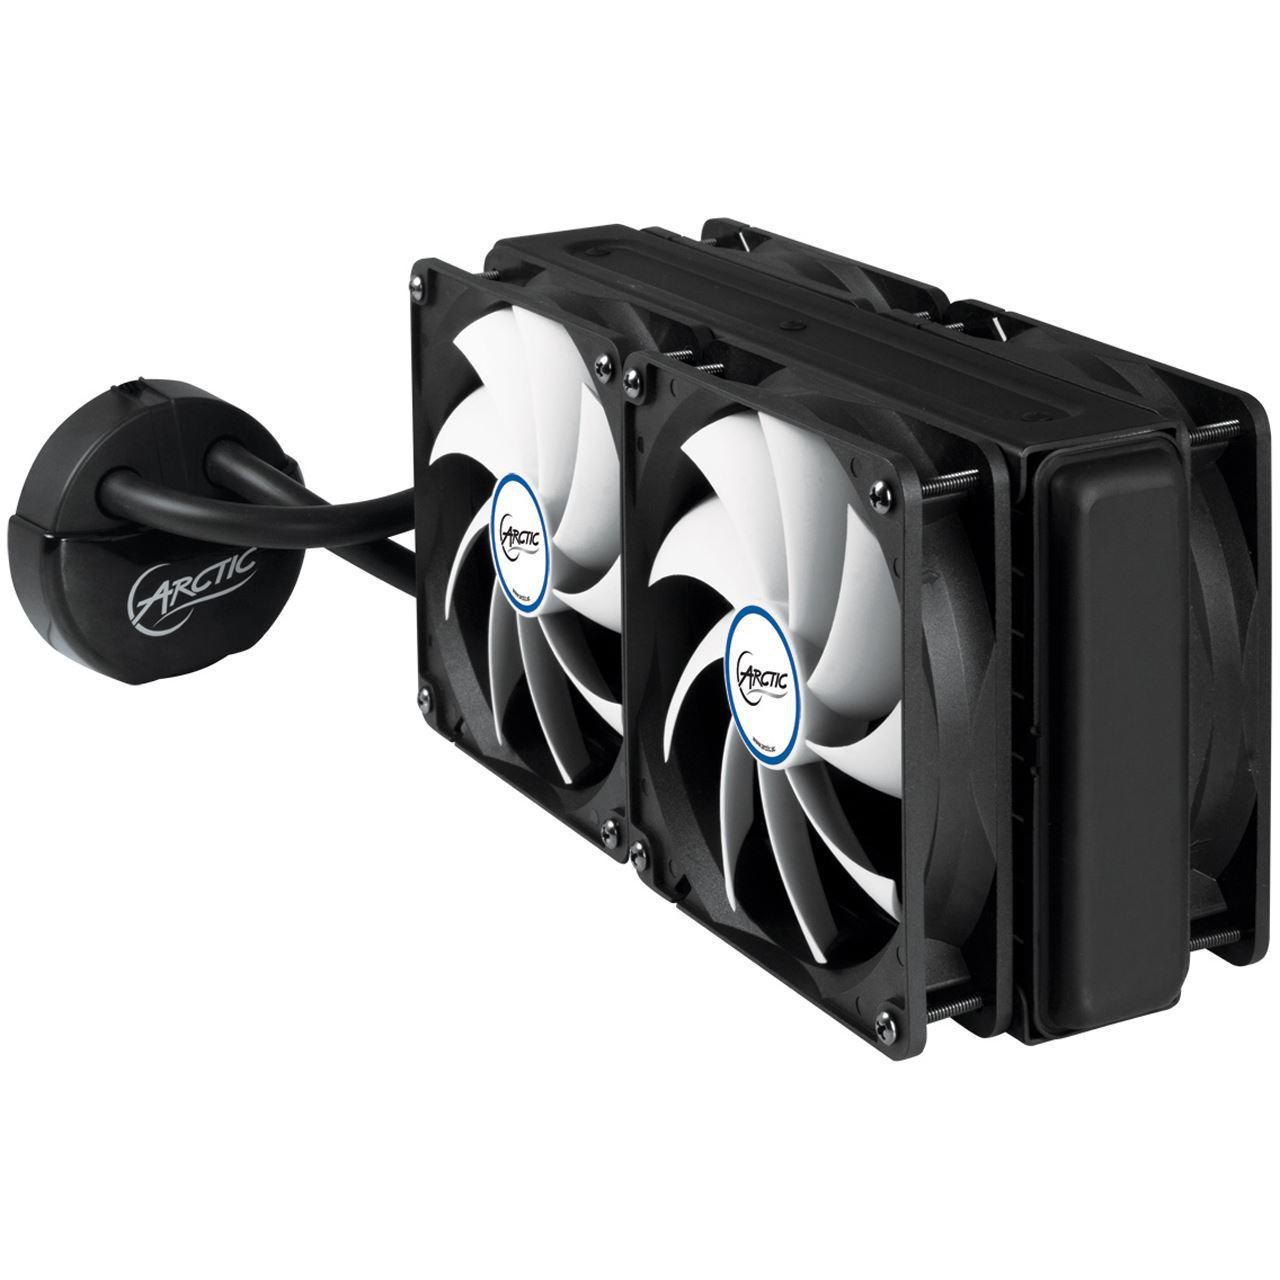 [NBB] ARCTIC Liquid Freezer 240 AiO Wasserkühlung (alle Sockel) - 67€ statt 79€